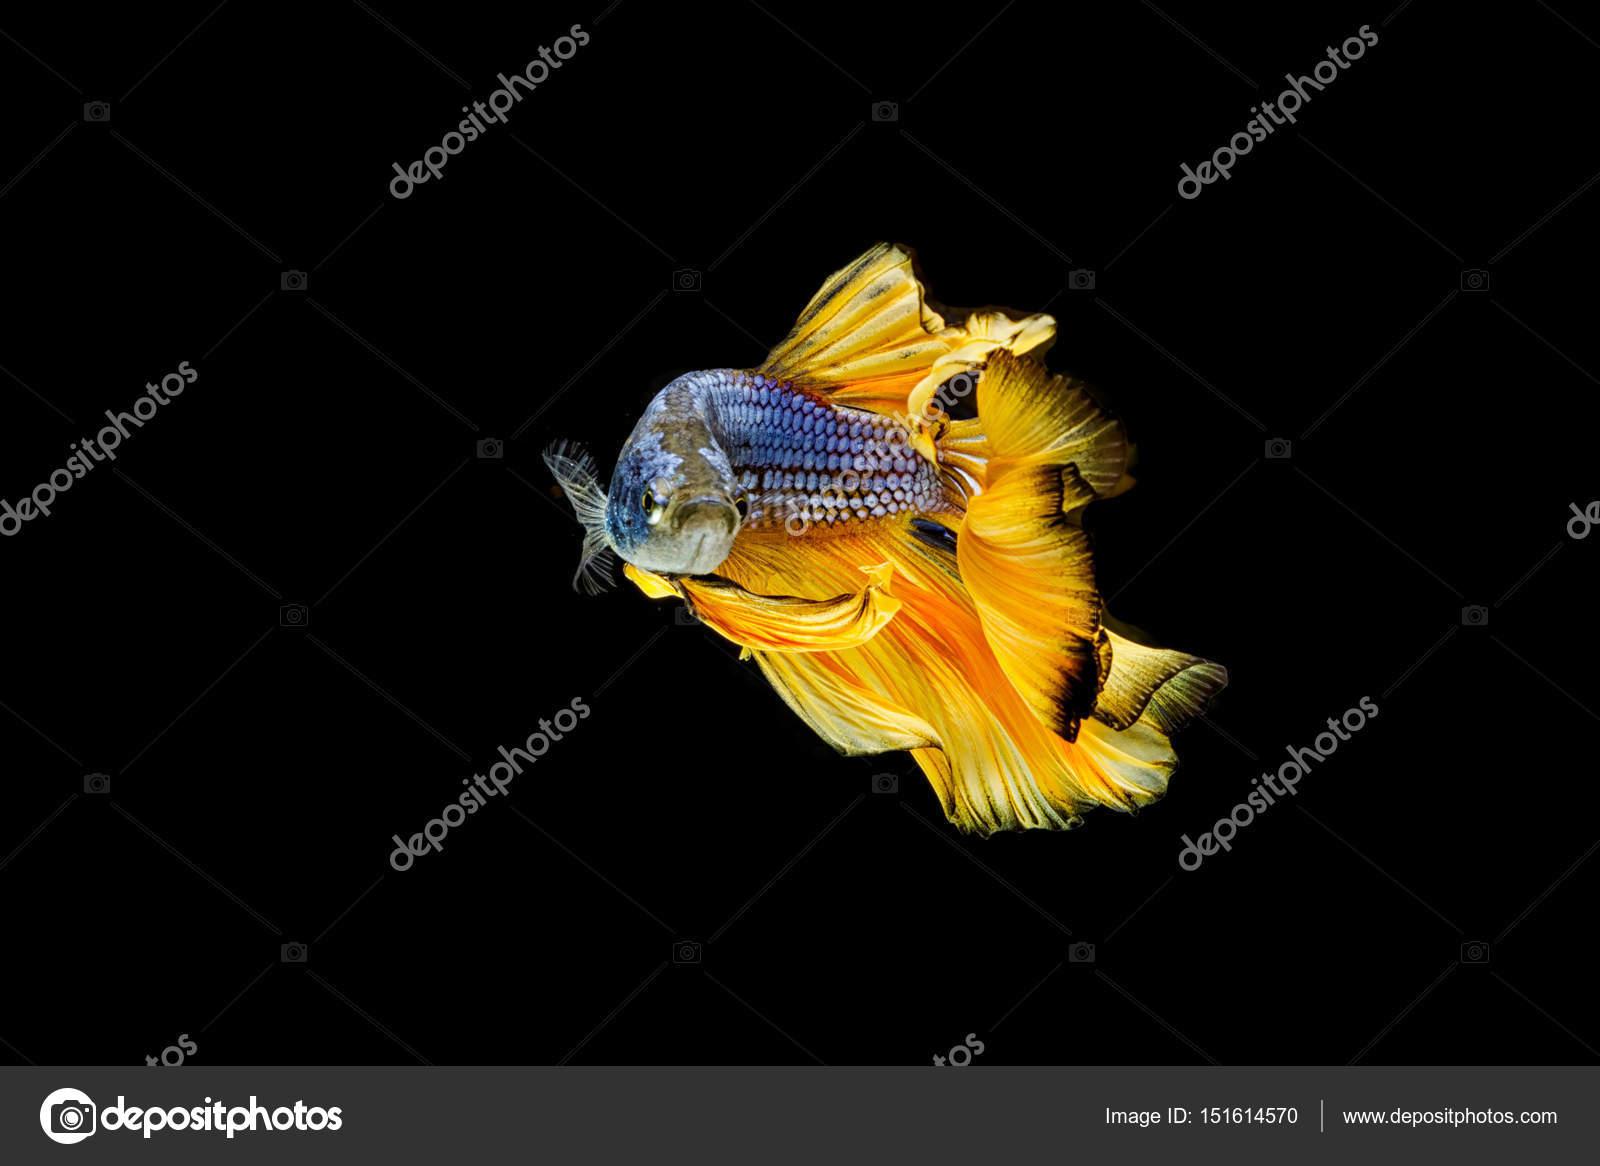 Betta Fish Siamese Fighting Fish Aquarium Fish Stock Photo